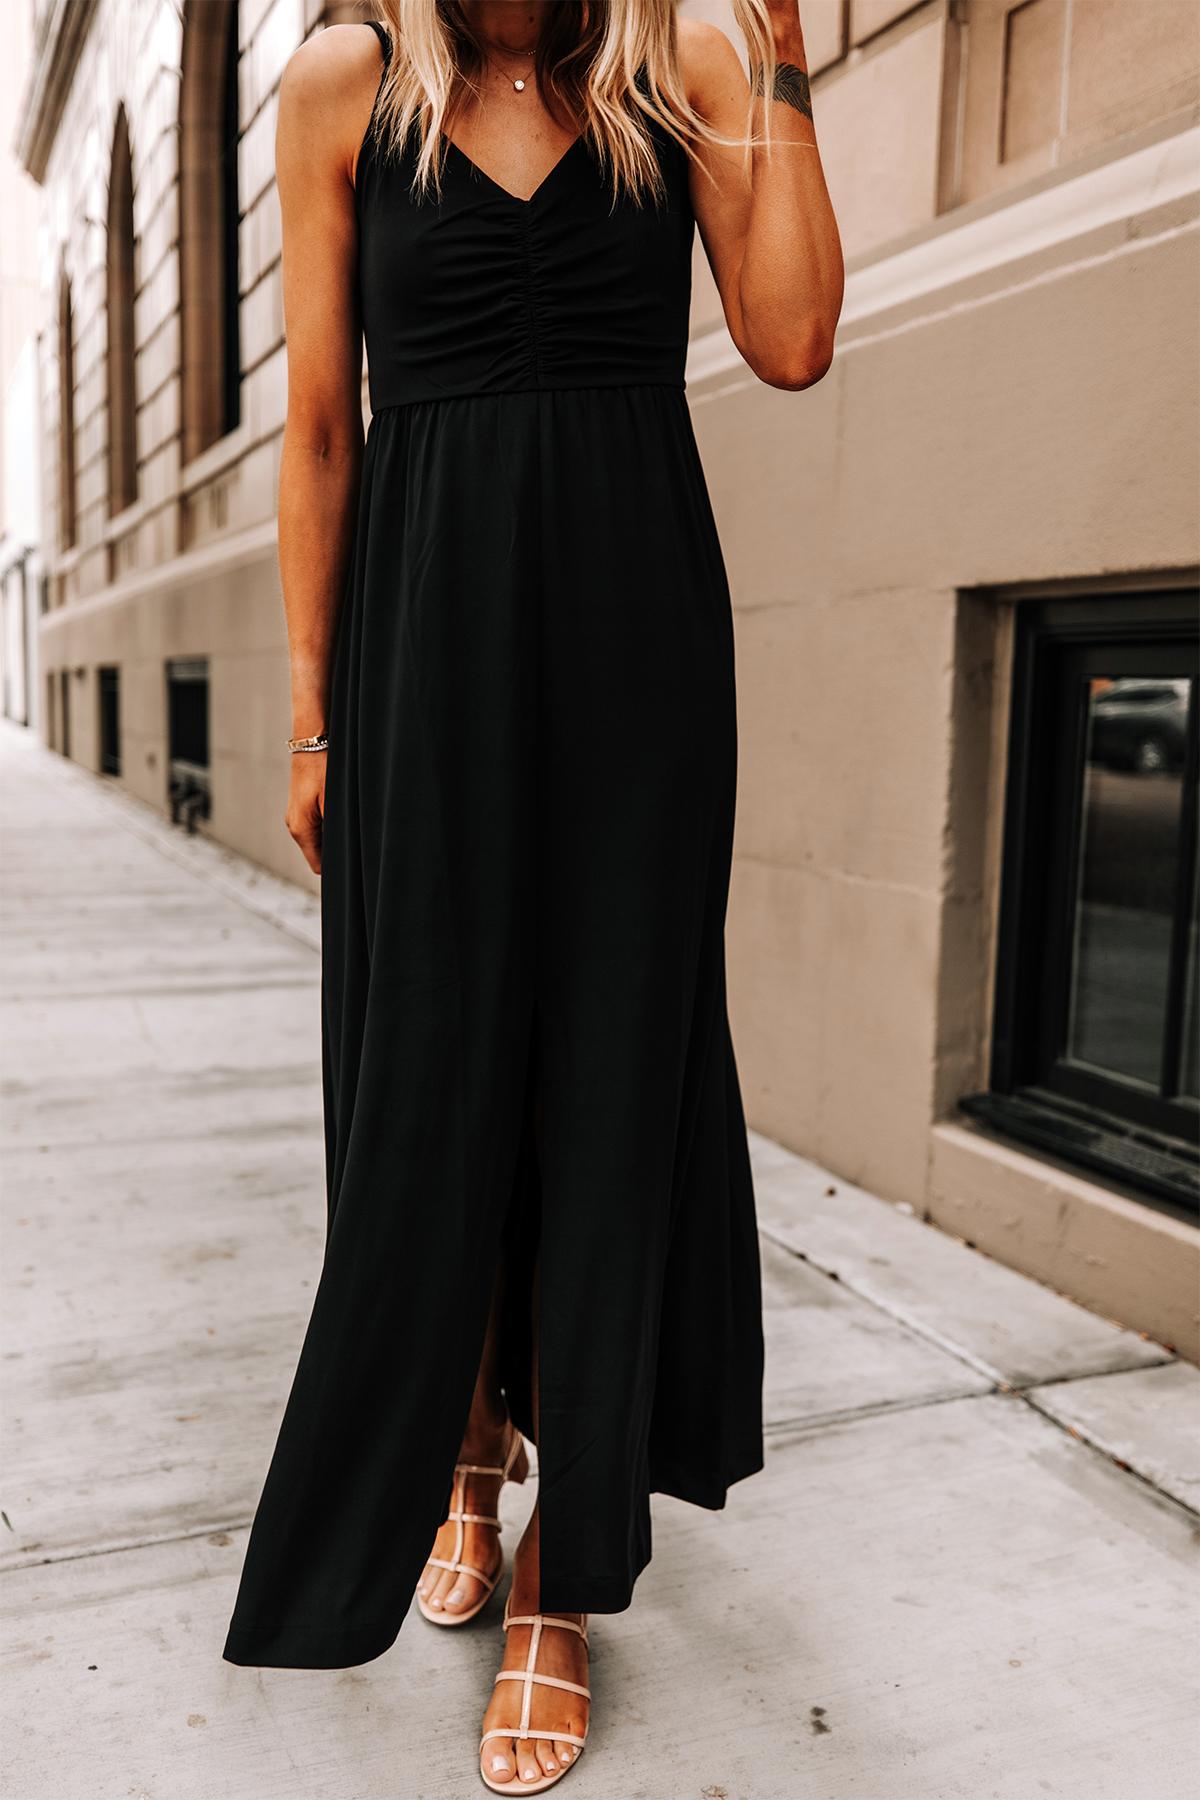 Fashion Jackson Wearing Banana Republic Black Maxi Dress Tan Sandals 2